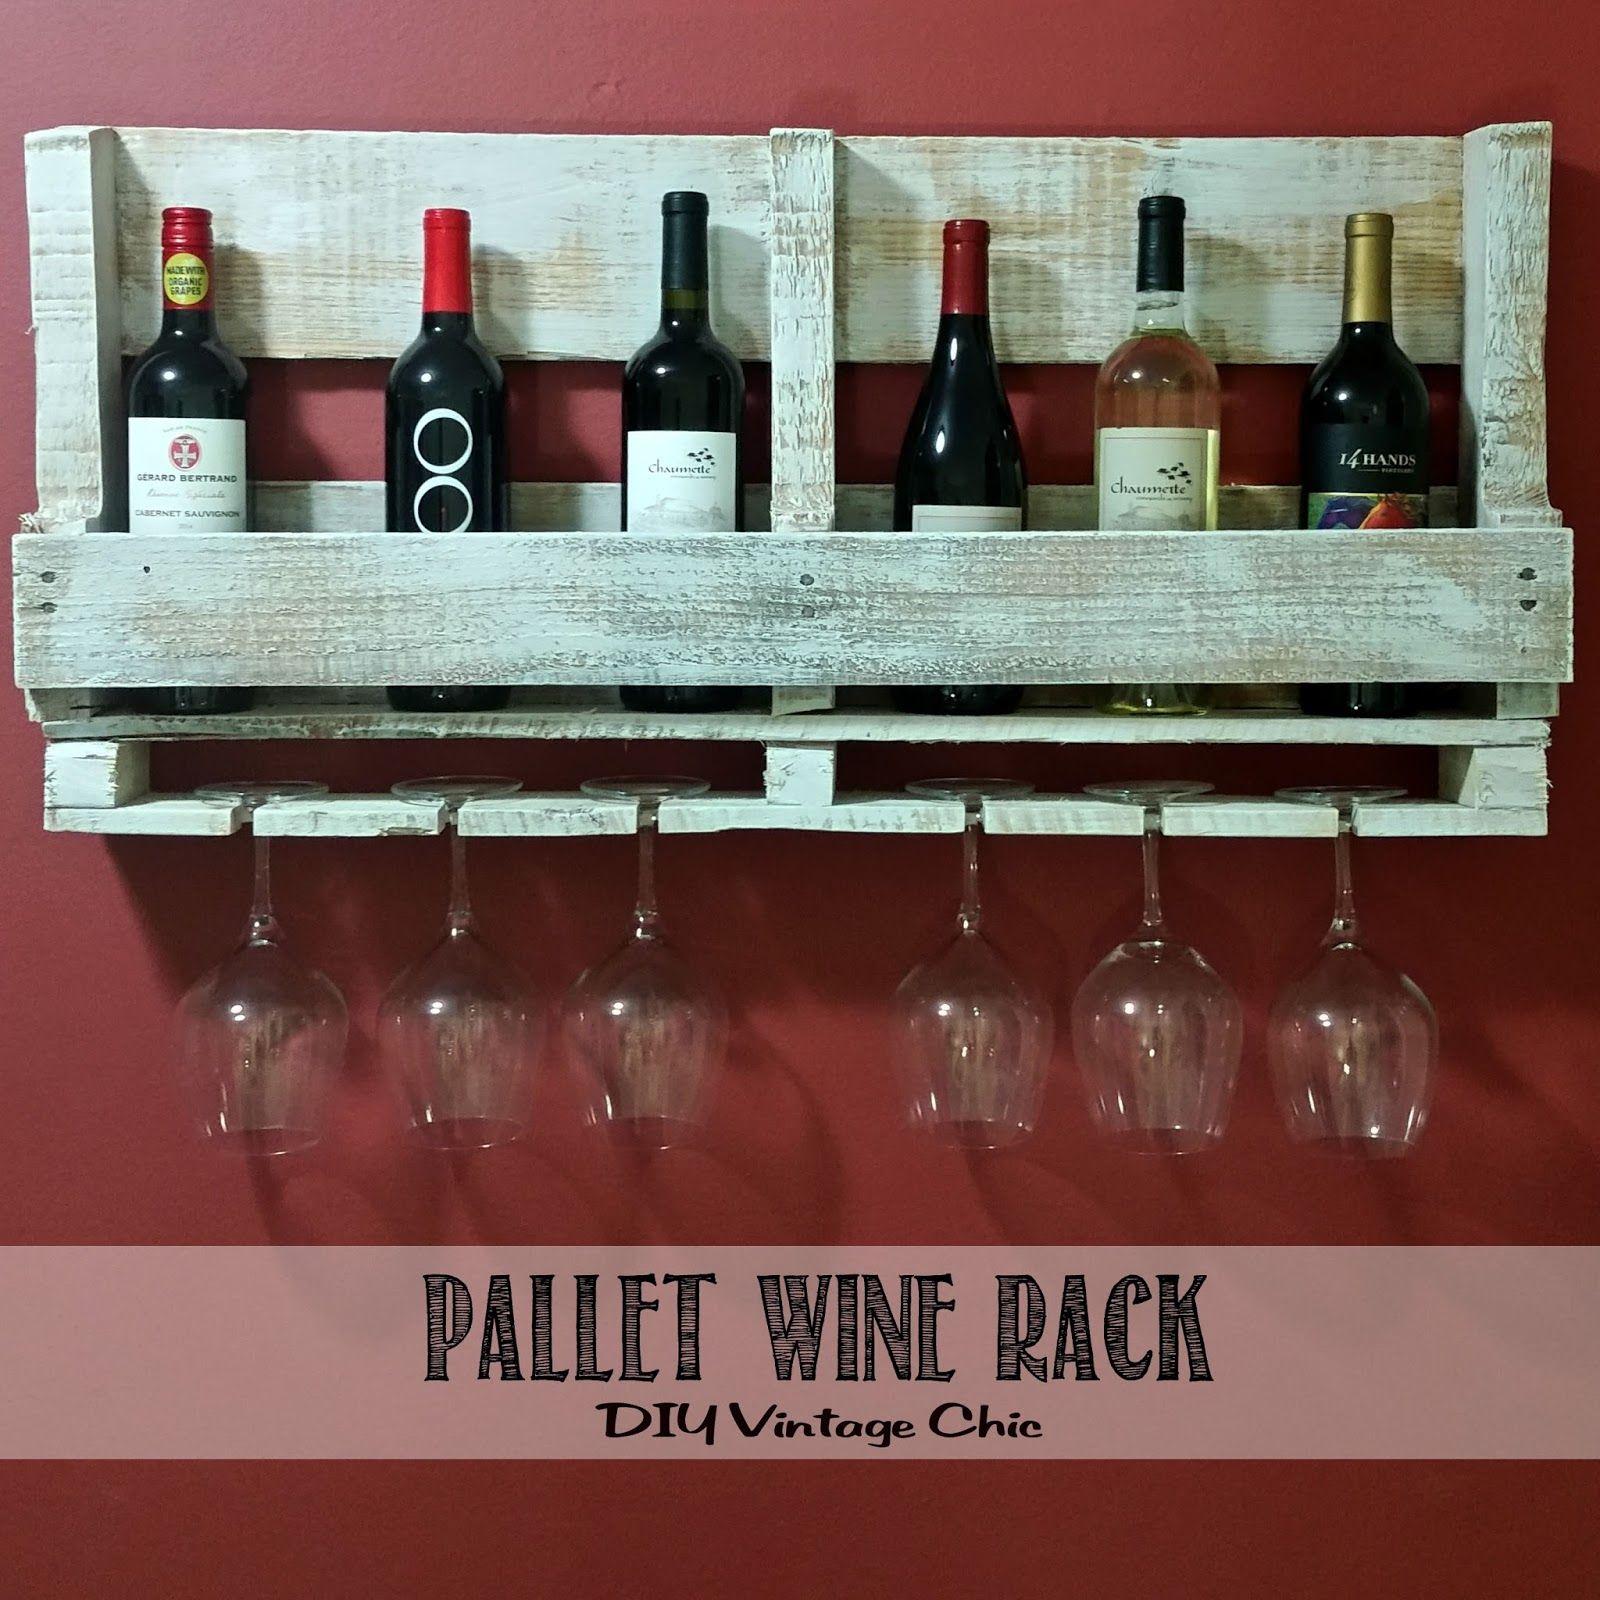 Ordinary Pallet Wine Rack Part - 13: DIY Vintage Chic: Pallet Wine Rack